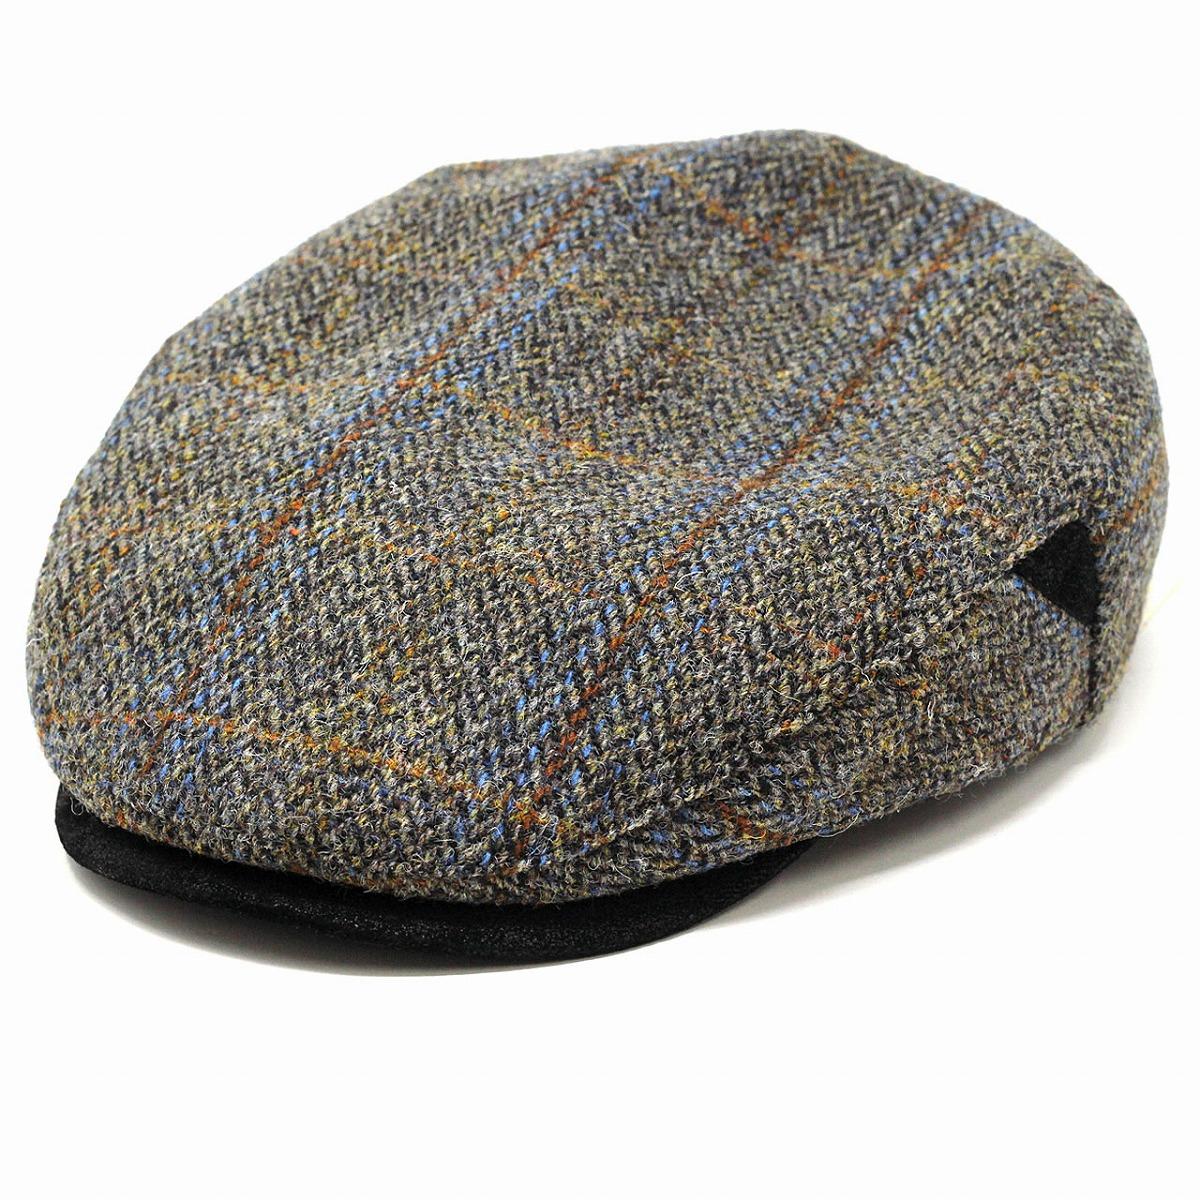 CHADWICK 帽子 ウール メンズ ハンチング帽 秋 冬 ハリスツイード ハンチング 帽子 メンズ STETSON ステットソン ヘリンボーン/グレー[ ivy cap ]男性 プレゼント 帽子通販 父の日 贈り物 ラッピング無料